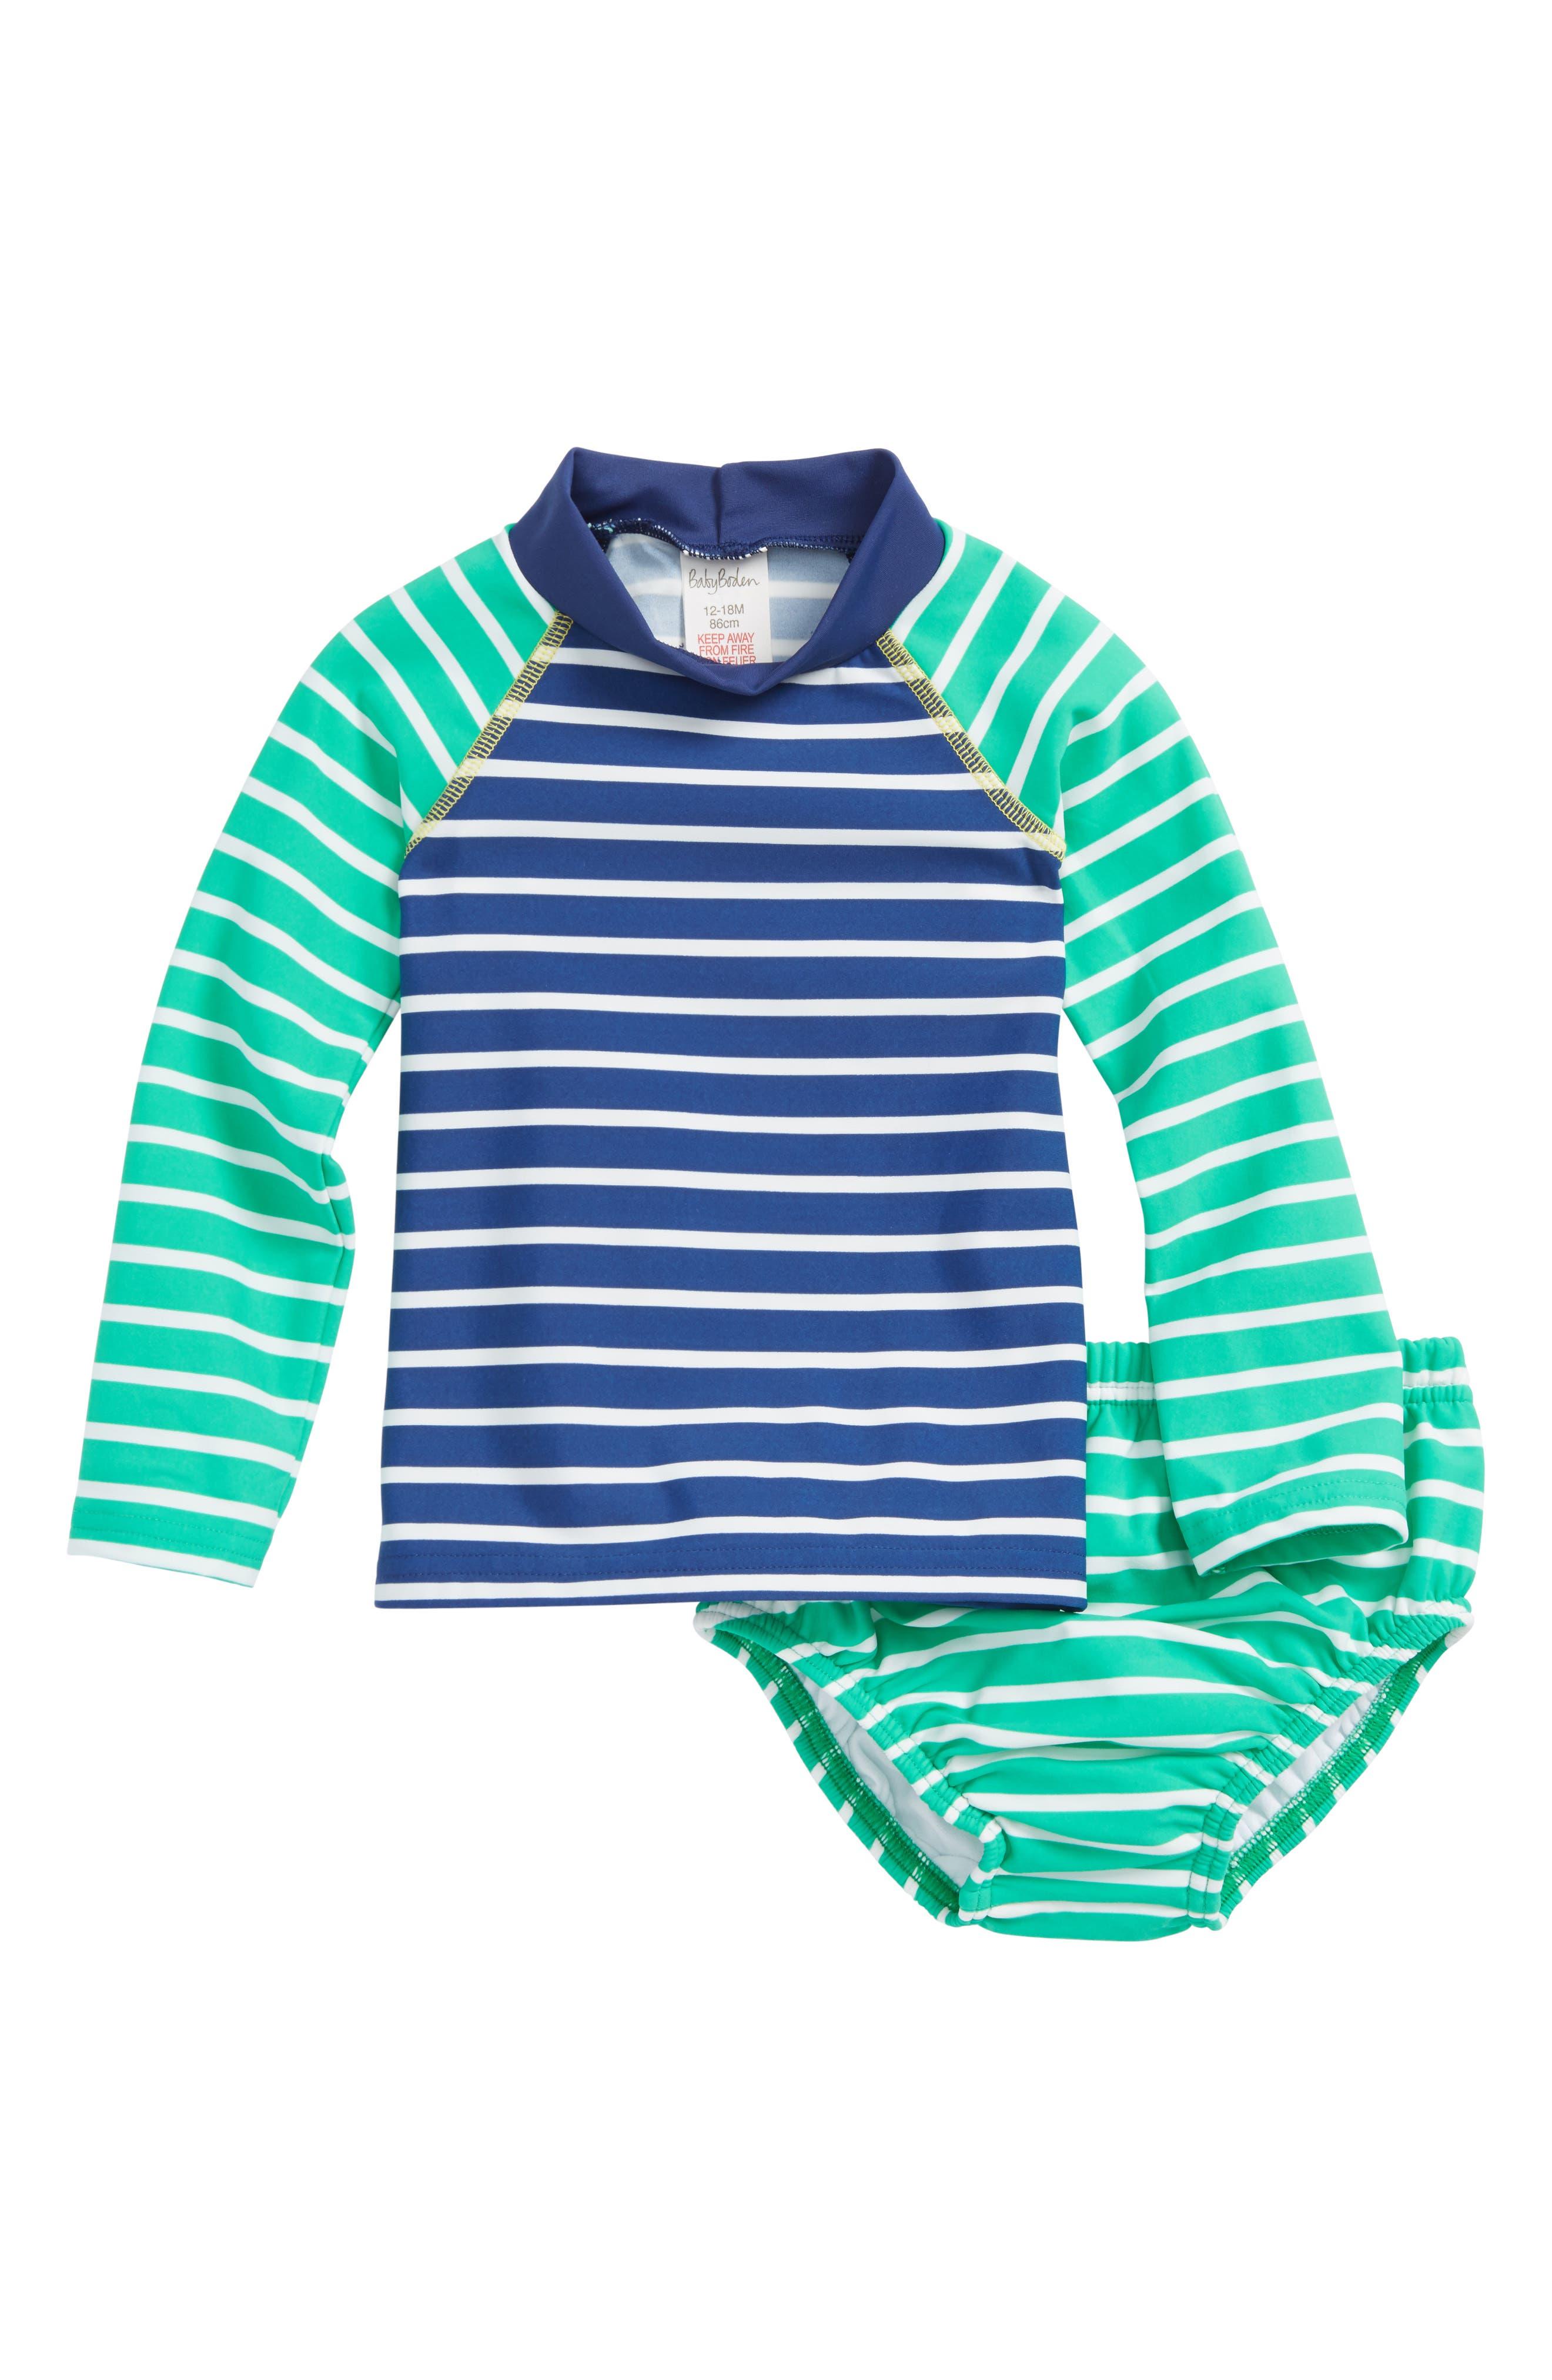 Two-Piece Rashguard Swimsuit,                             Main thumbnail 1, color,                             Astro Green/ Deep Sea